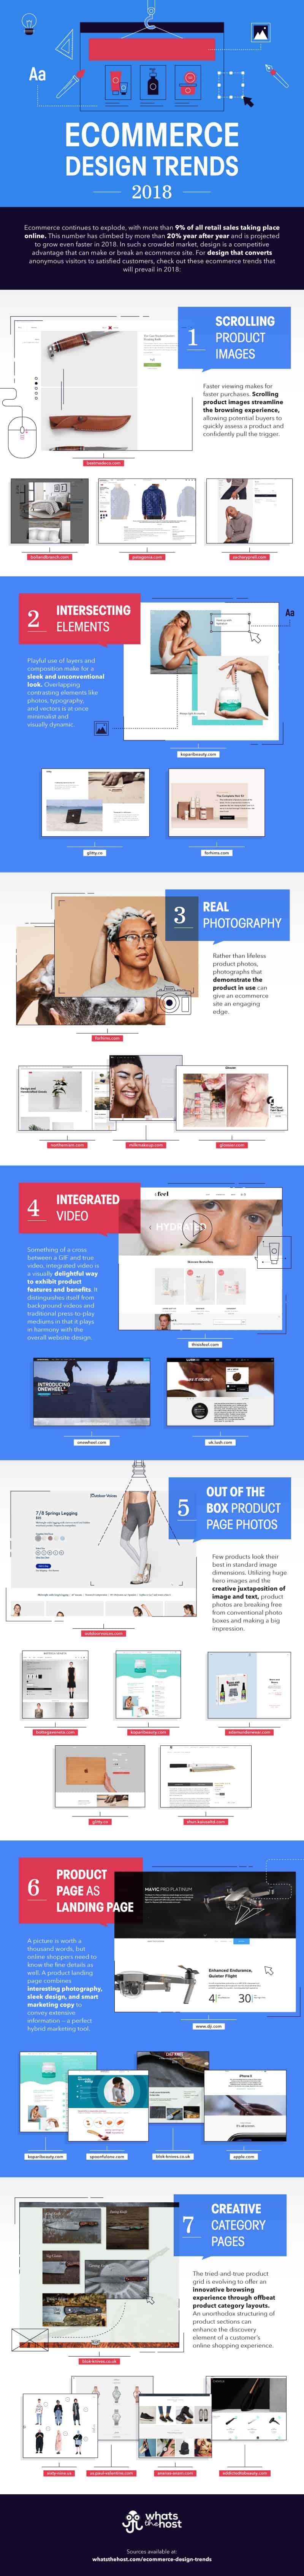 Ecommerce Design Trends 2018 Infographic